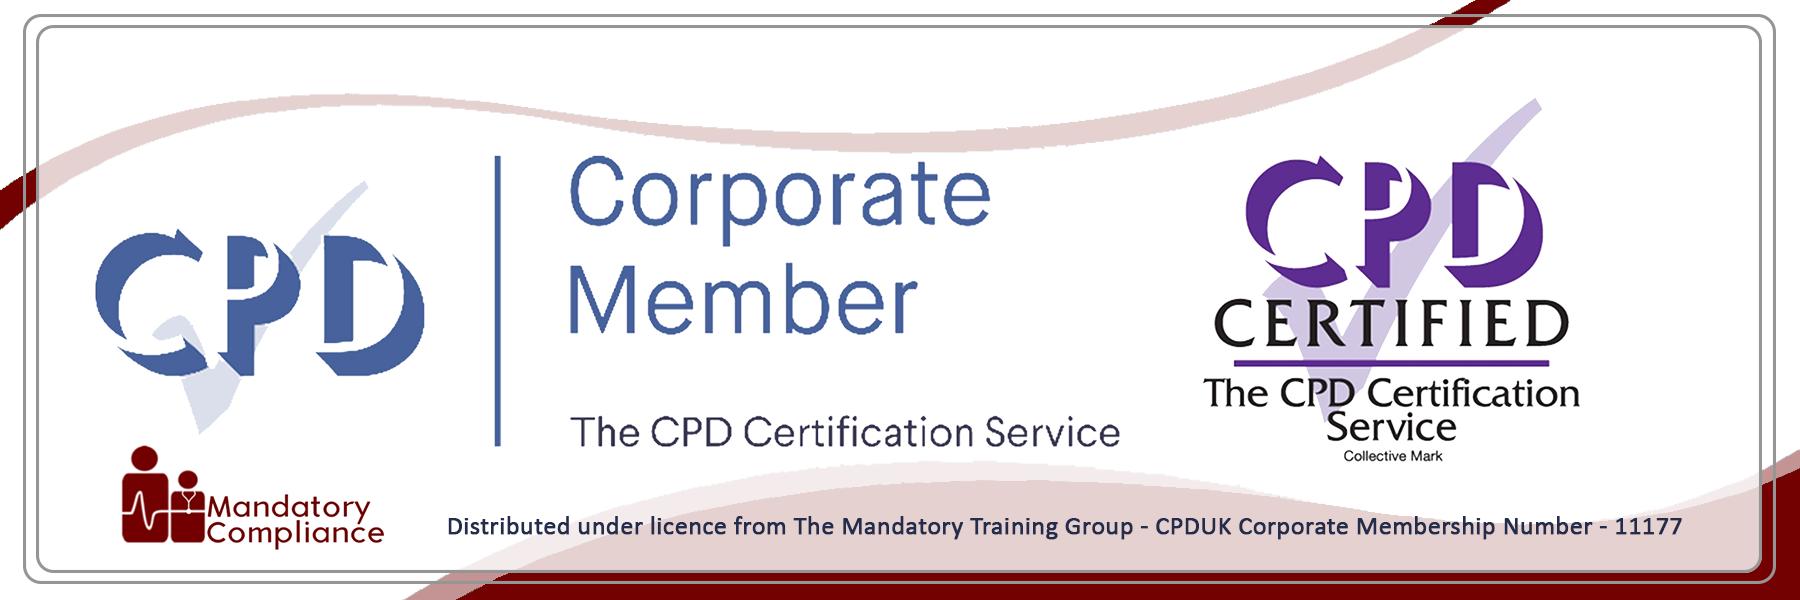 Business Communication - Online Learning Courses - E-Learning Courses - Mandatory Compliance UK---